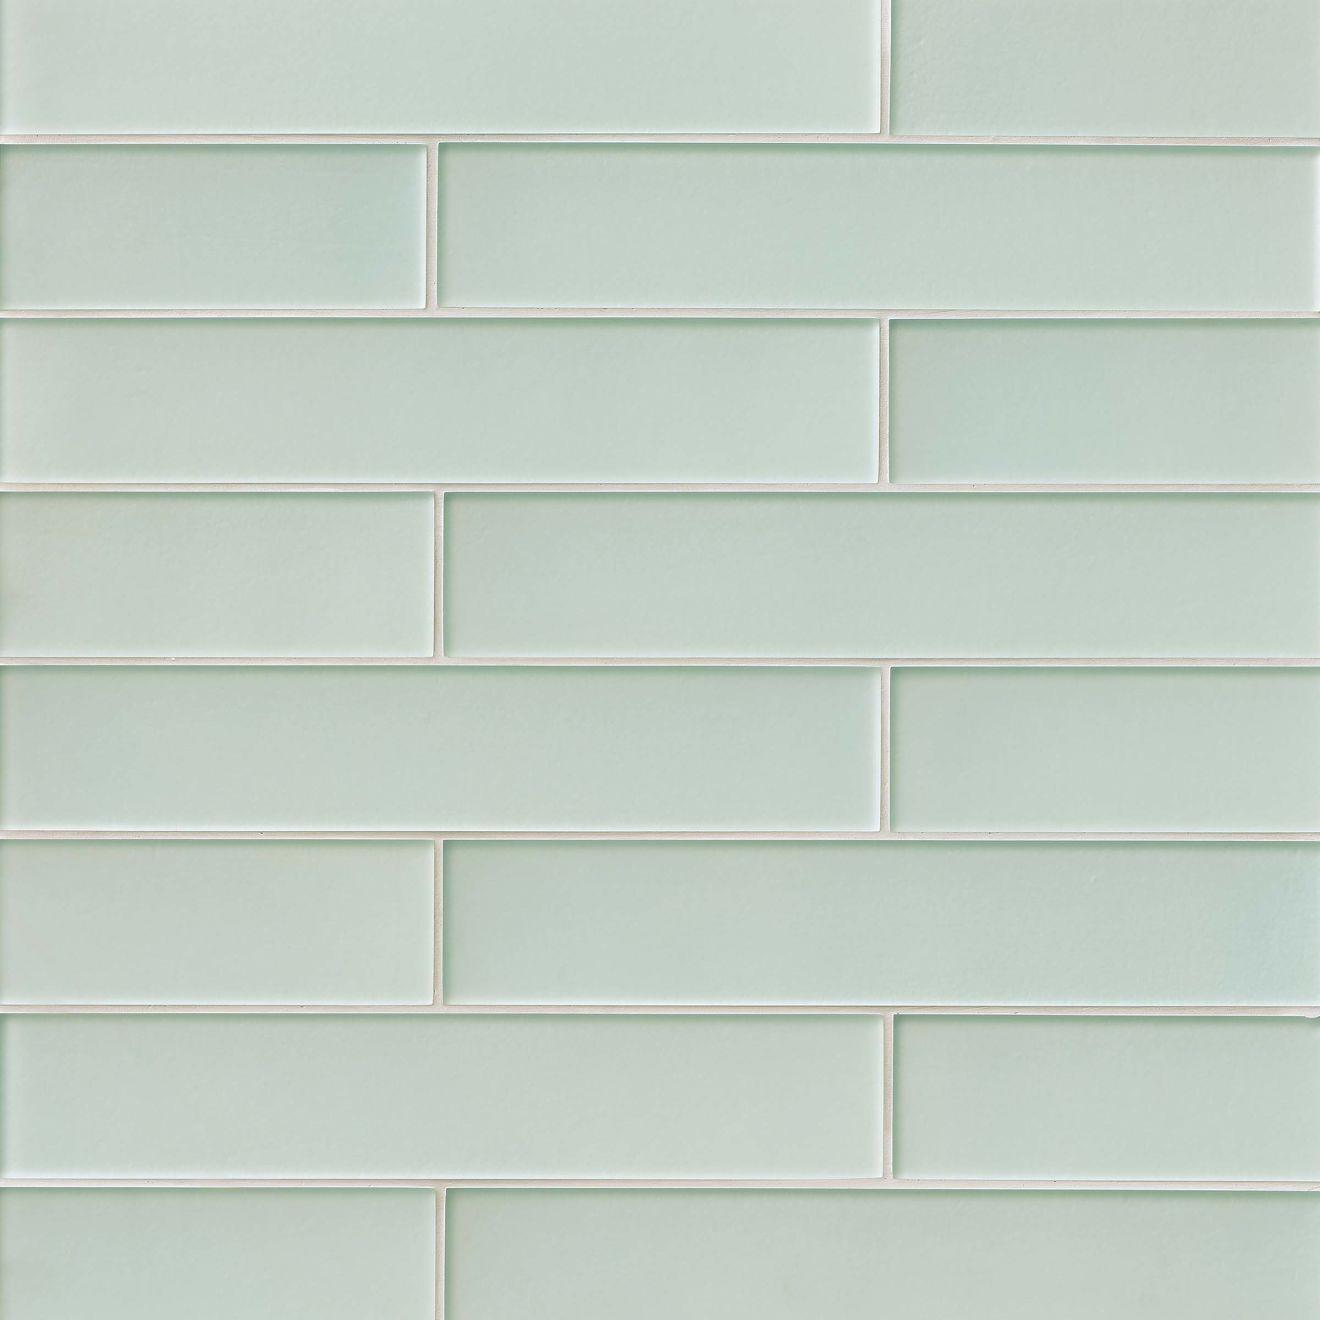 "Verve 3"" x 15.75"" Wall Tile in Ice Breaker"